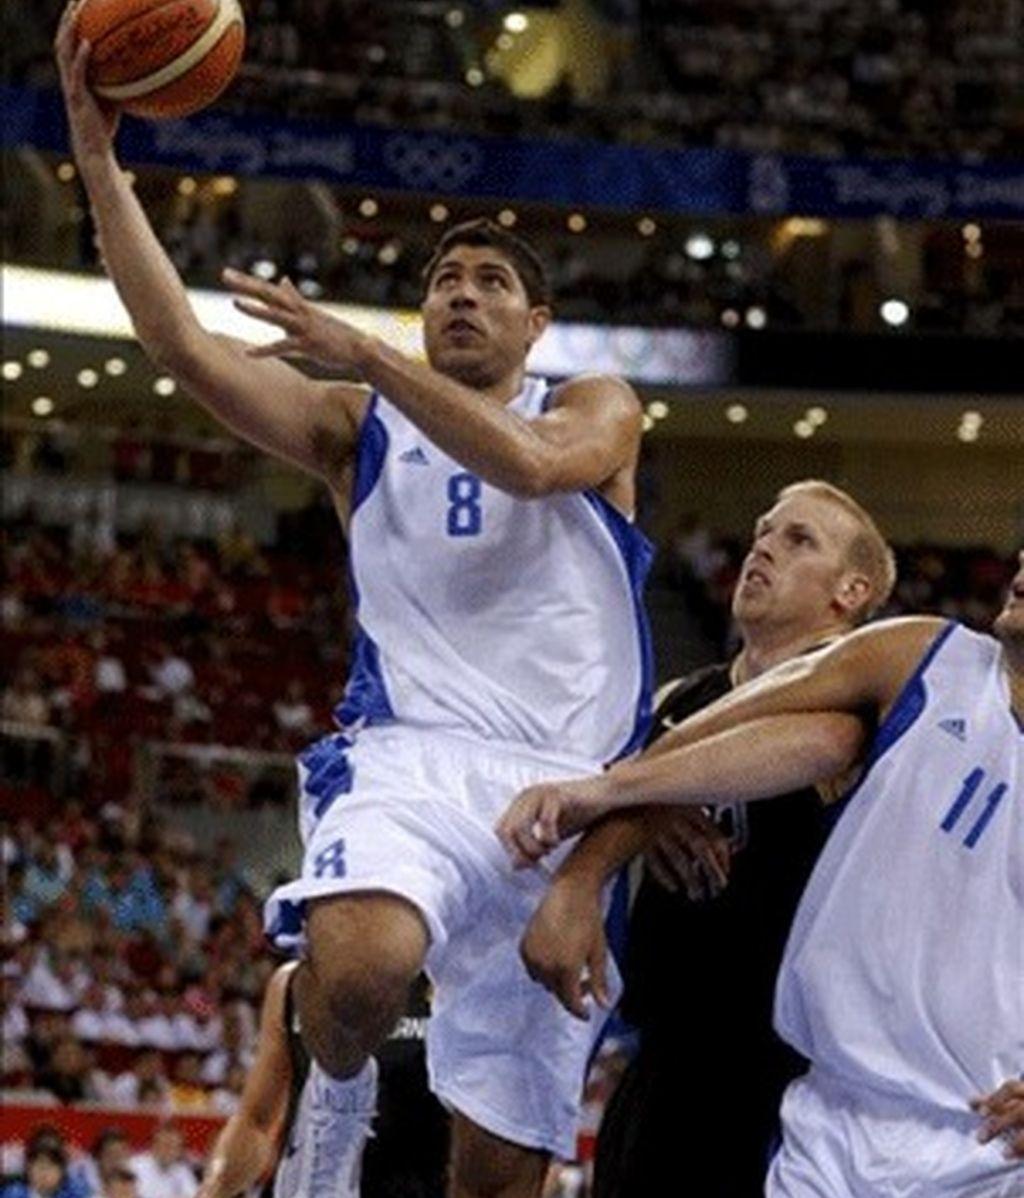 87-64. Grecia reacciona contra Nowitzki